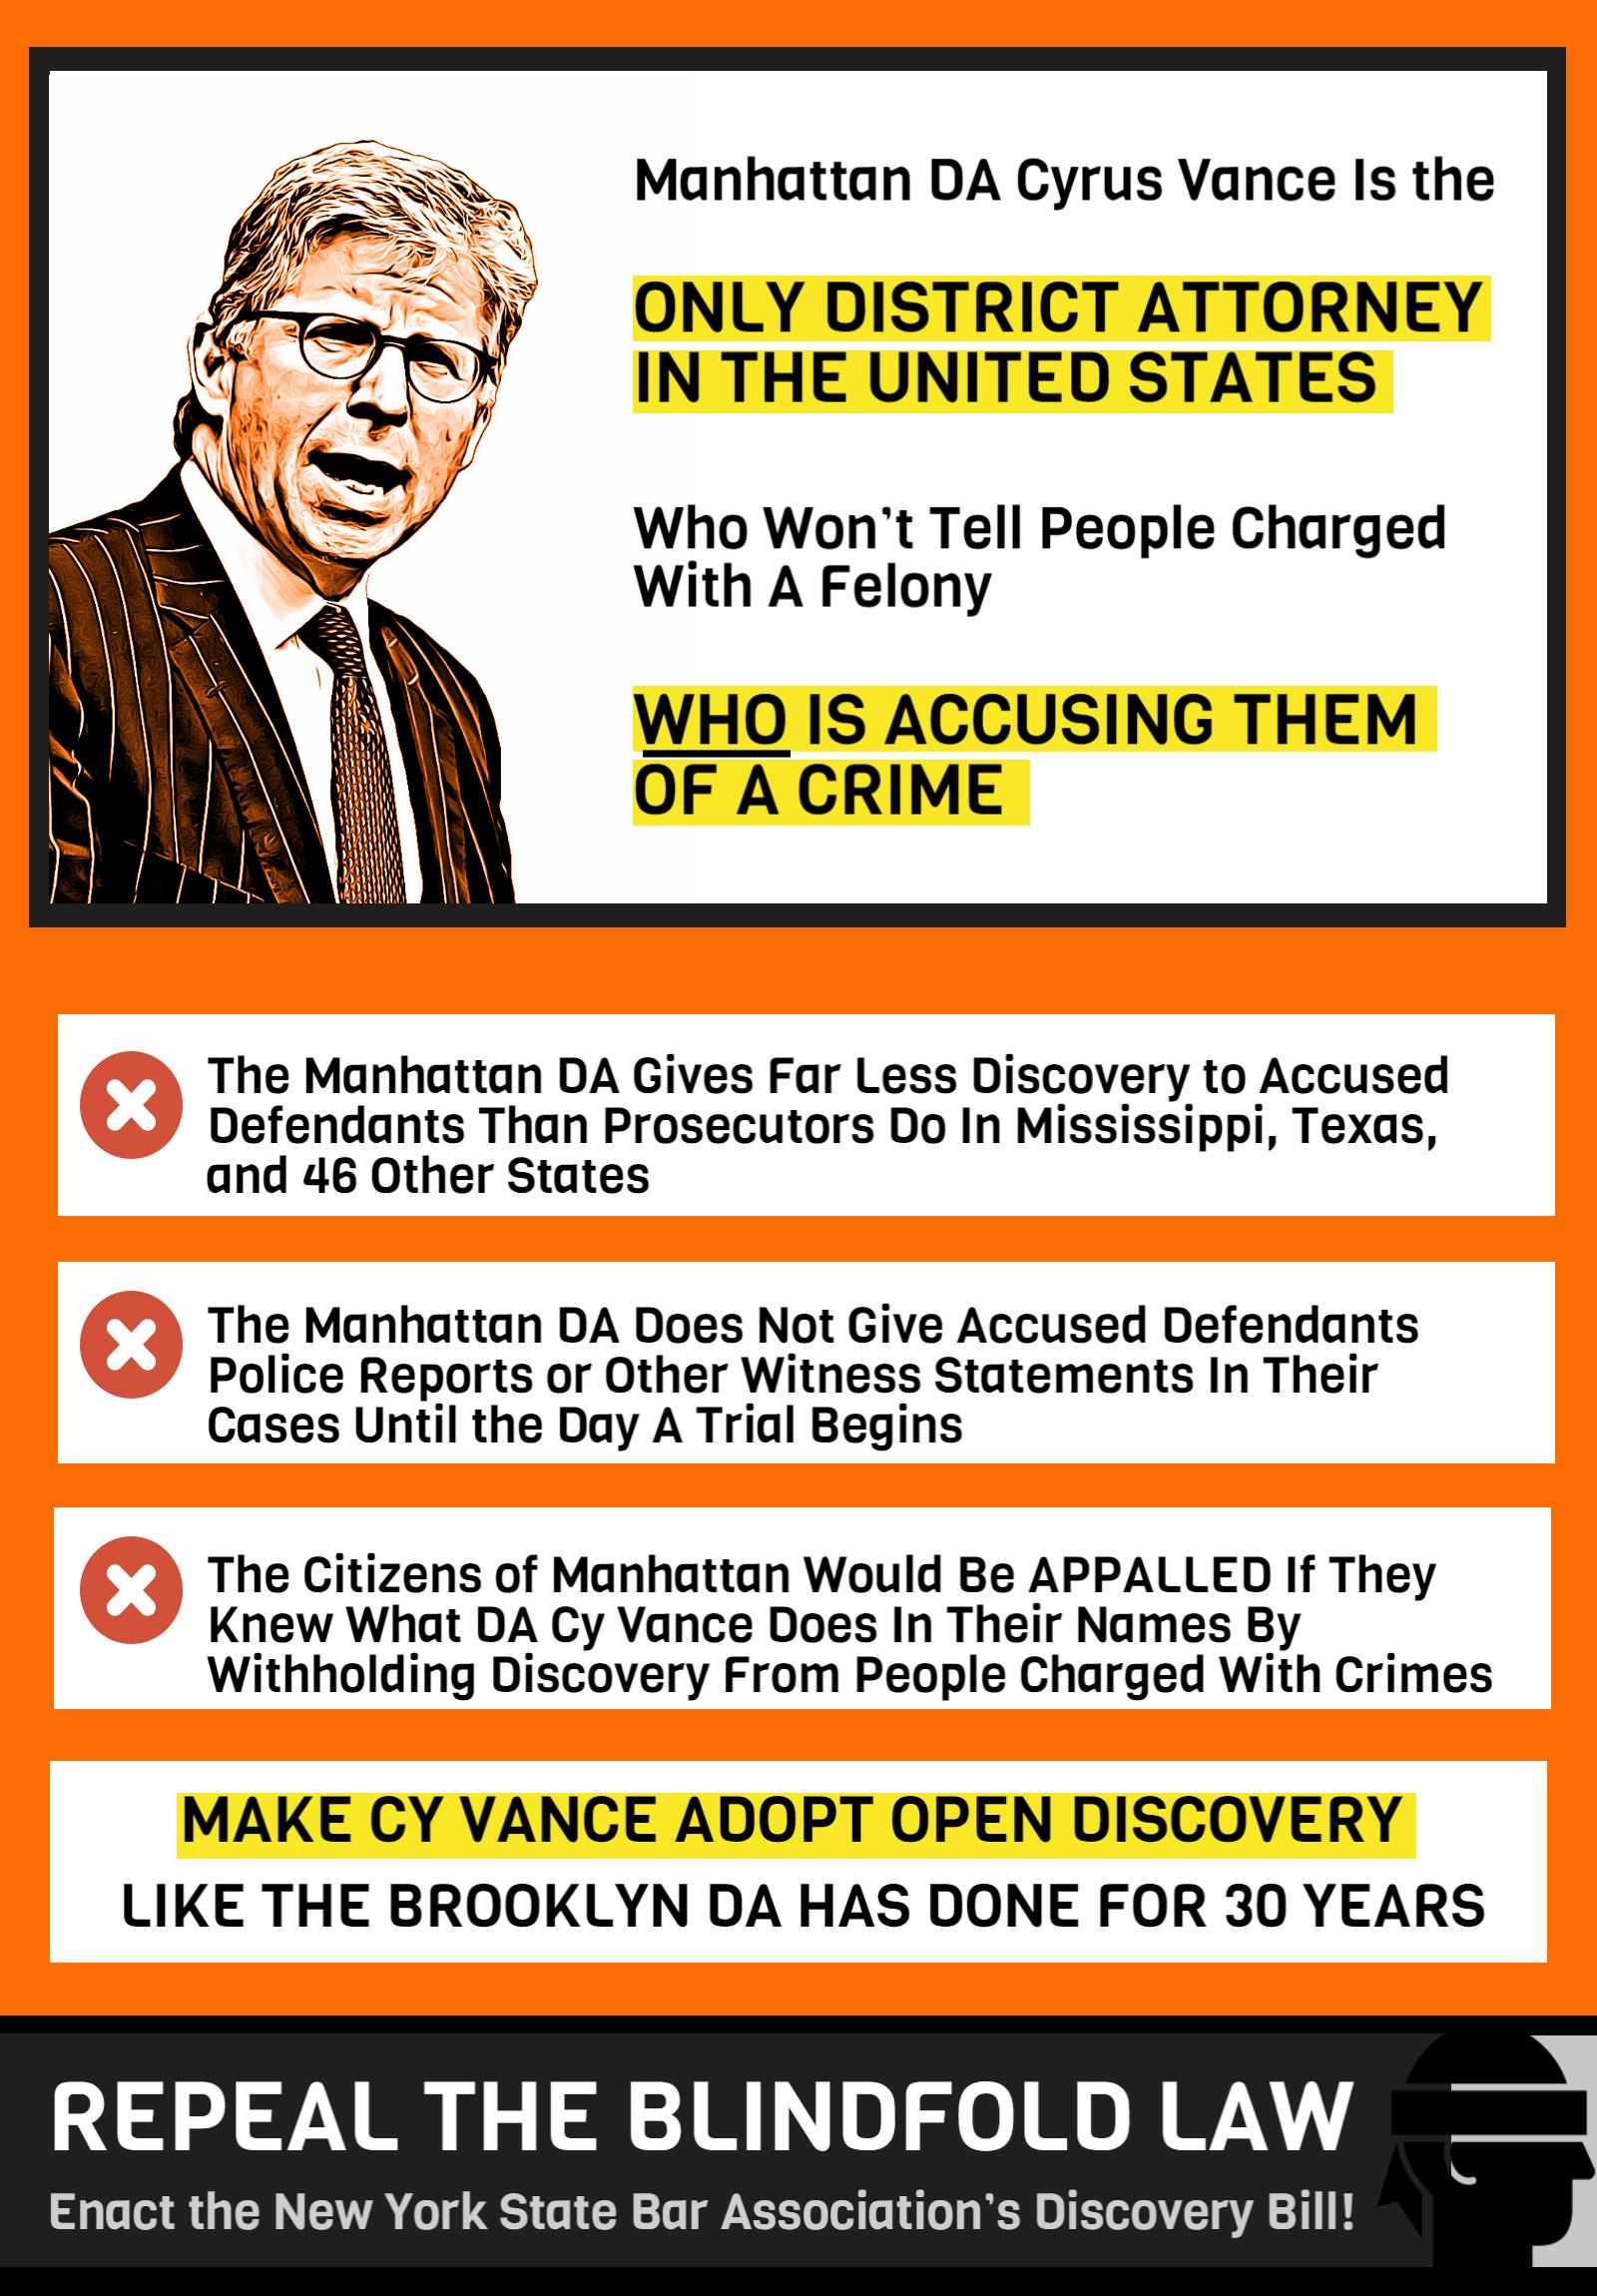 Vance Blindfold Law (FINAL)